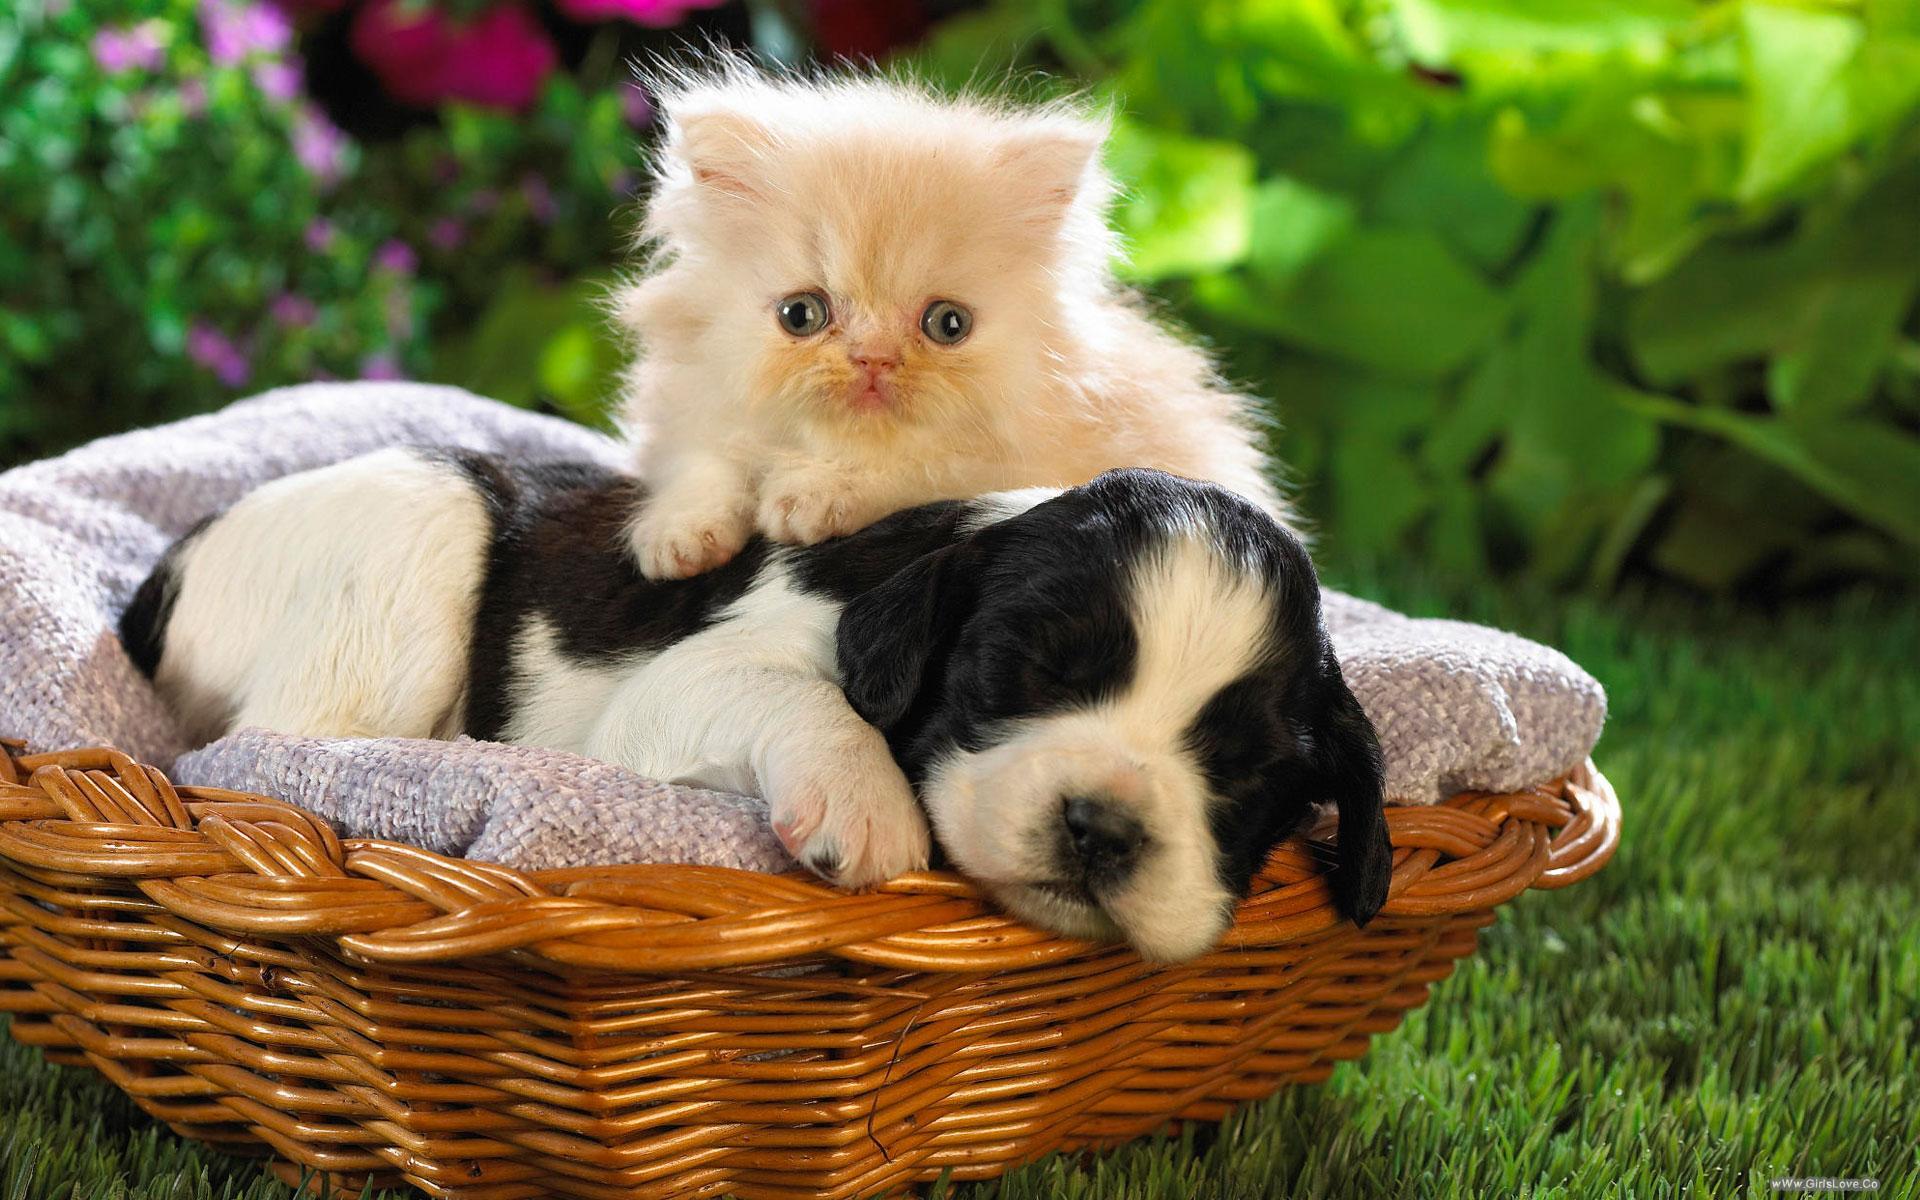 بالصور قطط وكلاب , صور قطط وكلاب كيوت 3561 2